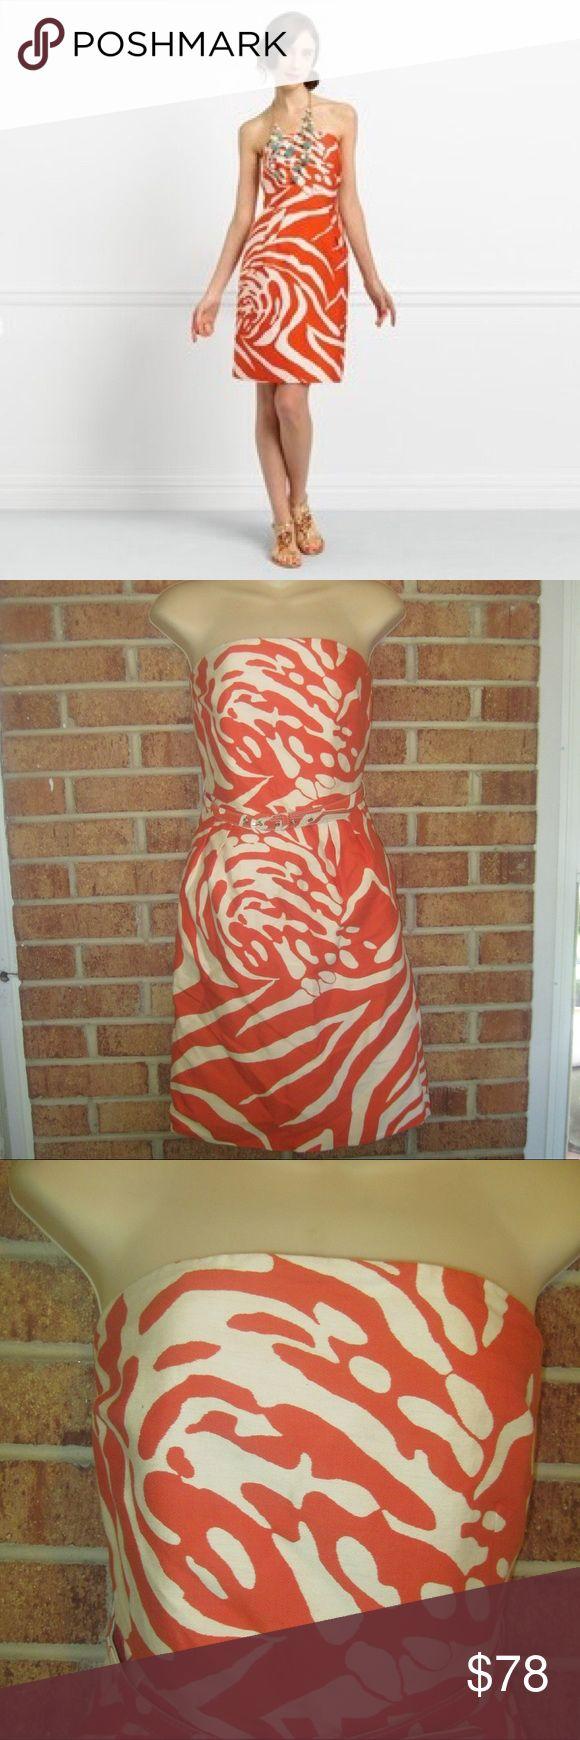 kate spade Jungle Jacquard Print Jo Dress Size: 4. Length: Approximately 30 inches long. Waist: Approximately 27 inches. Approximately 15 inches from armpit to armpit. Print: Jungle Jacquard. Strapless. Tulip skirt. Slanted front pockets. Slim, removable belt. Side boning. Rear zipper. Lined. 91% Cotton, 9% Silk. Lining is 100% Acetate. kate spade Dresses